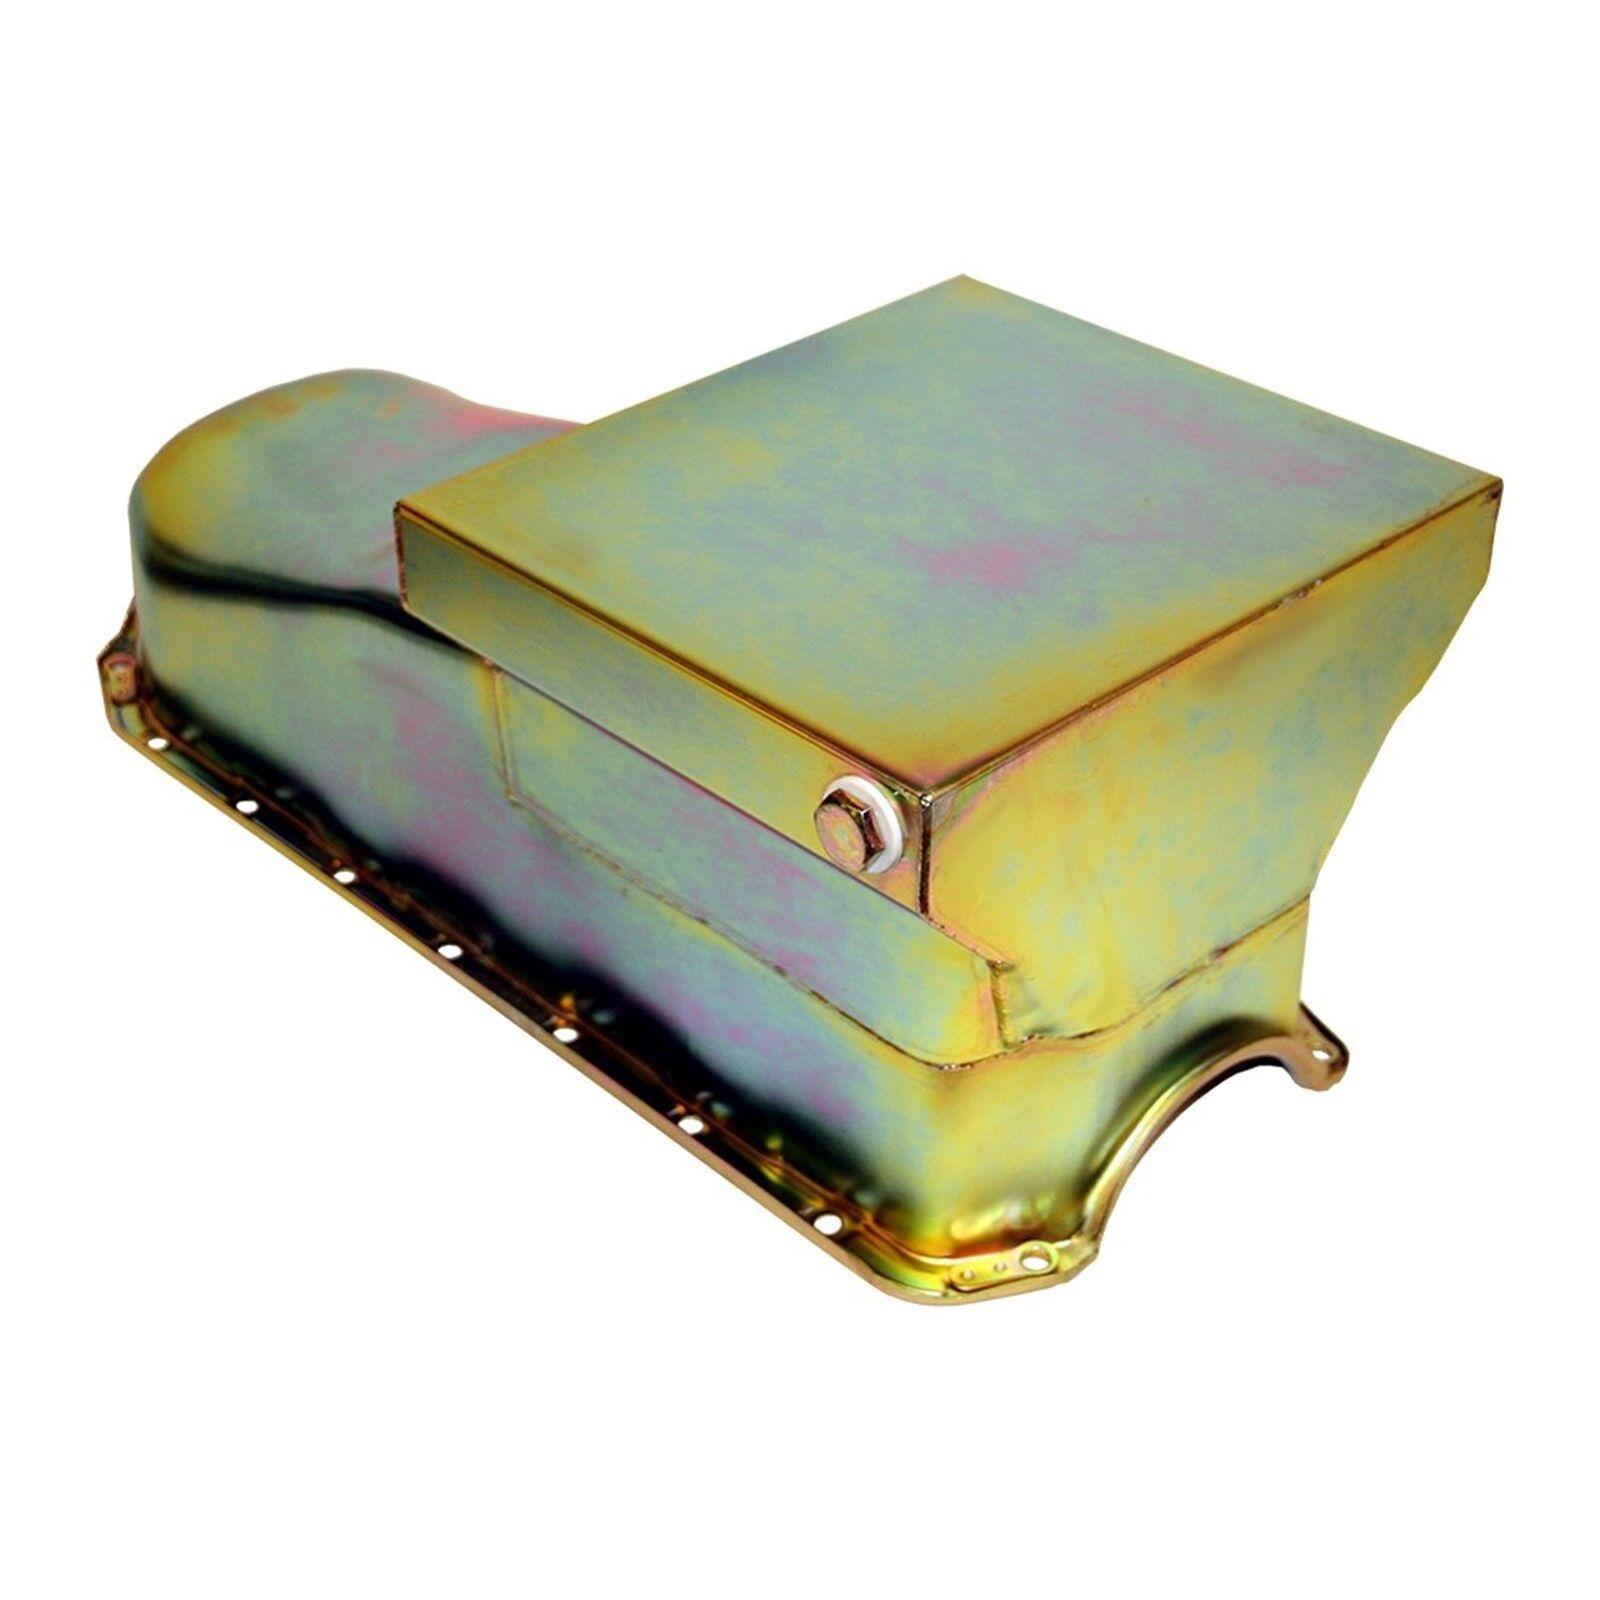 Zinc Drag Race Style Oil Pan 7qt - 58-79 SBC Chevy 283 327 350 400 Small Block